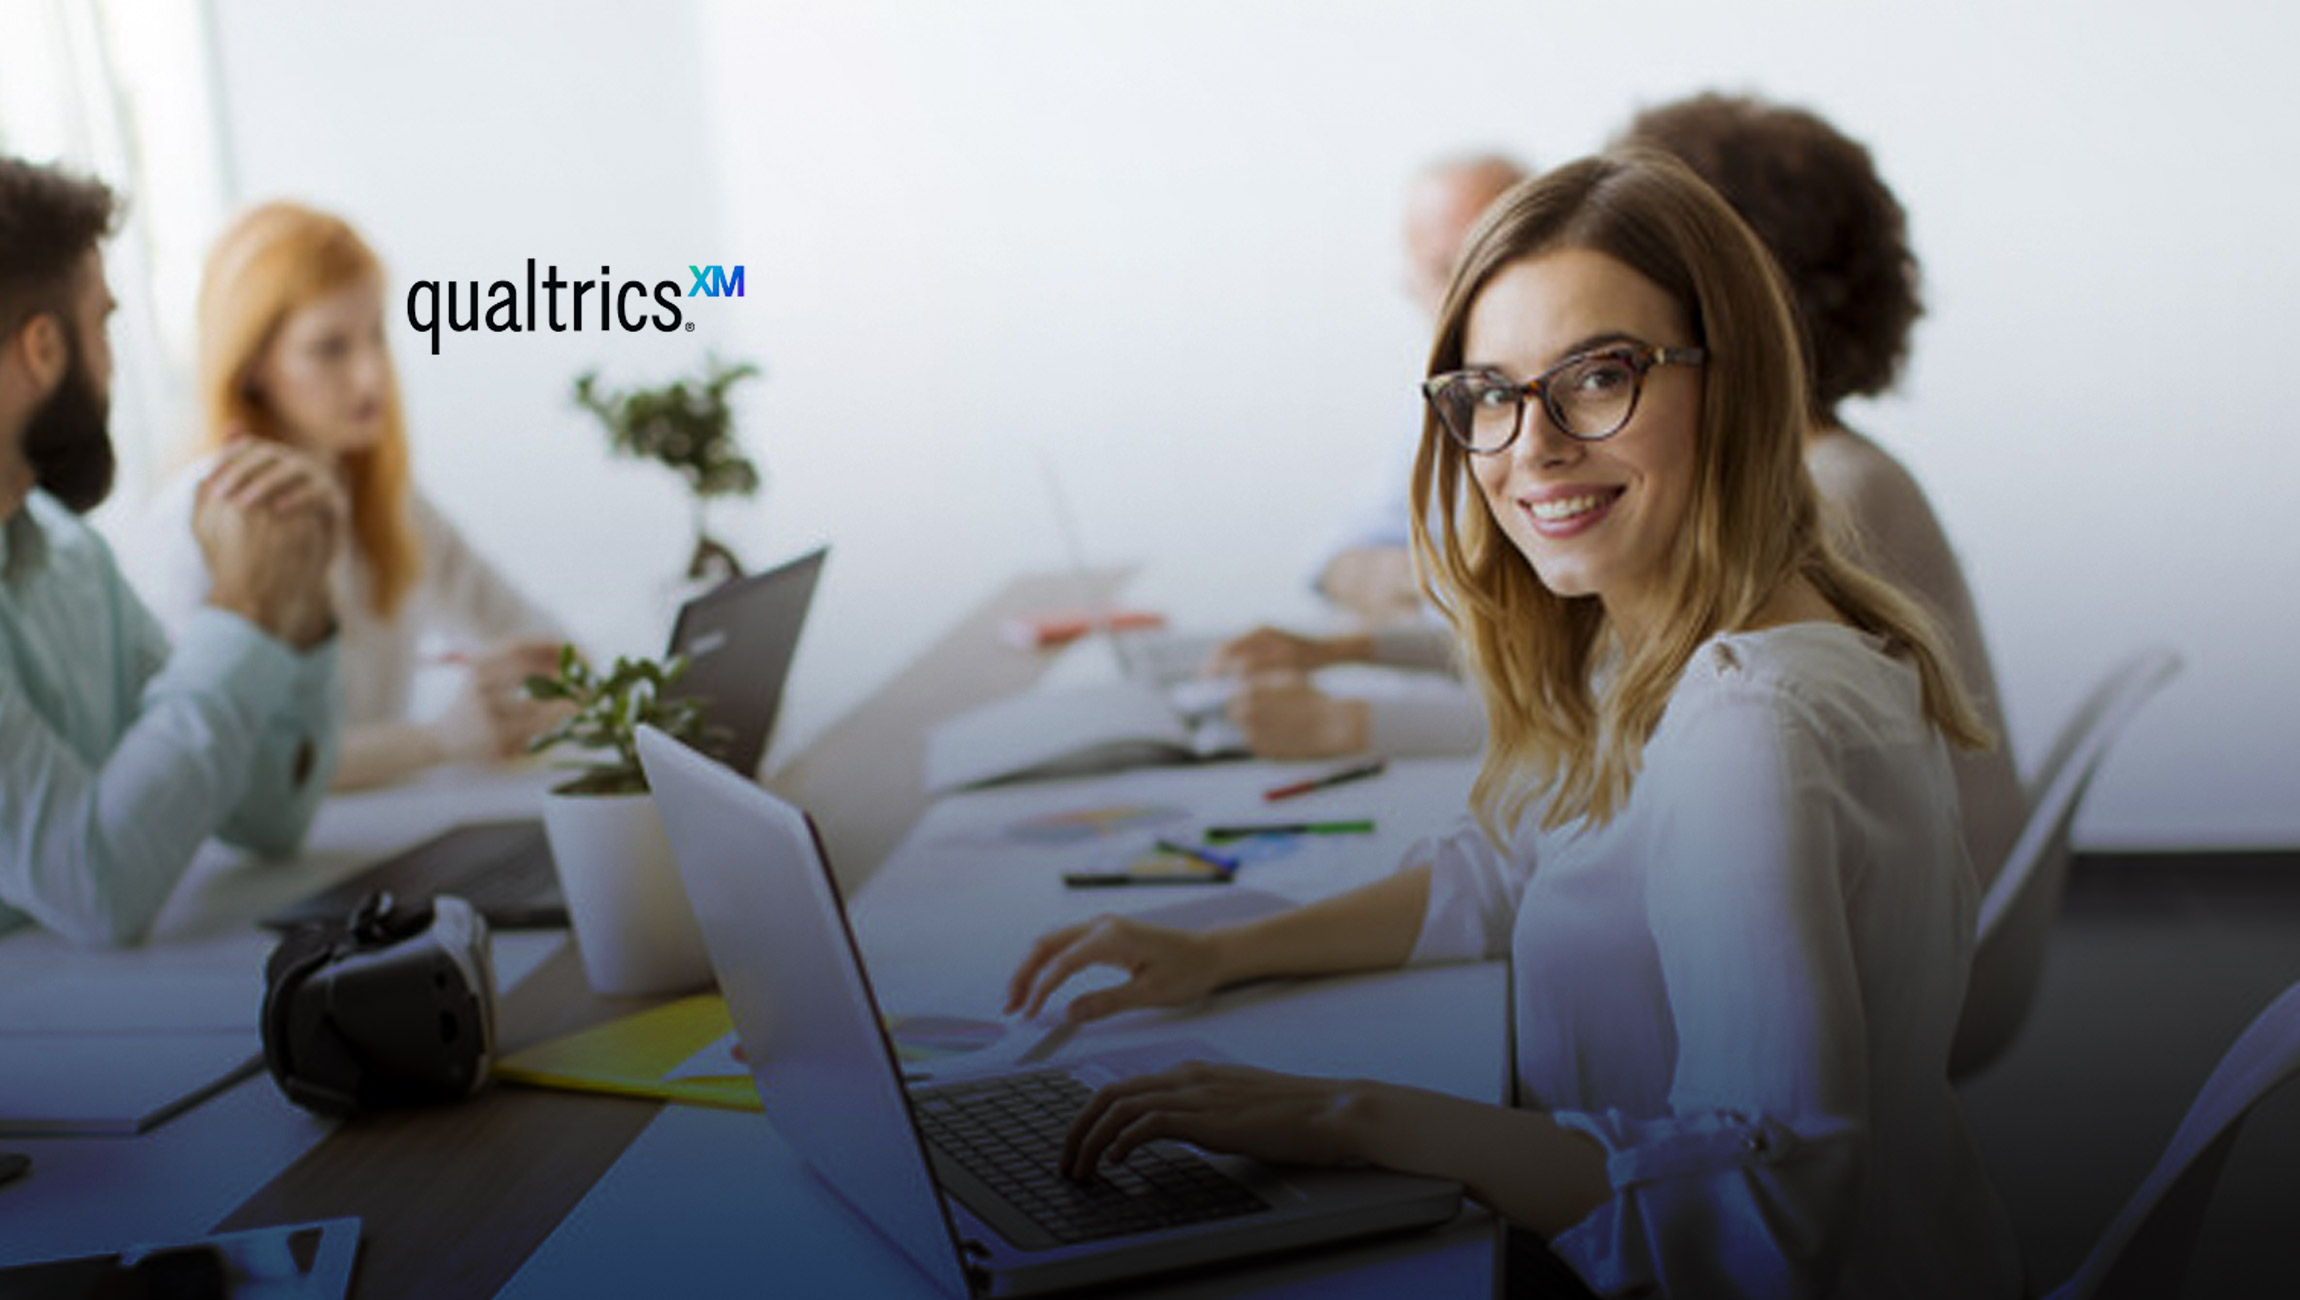 Qualtrics Named a Leader in Gartner's 2020 Magic Quadrant for Voice of the Customer